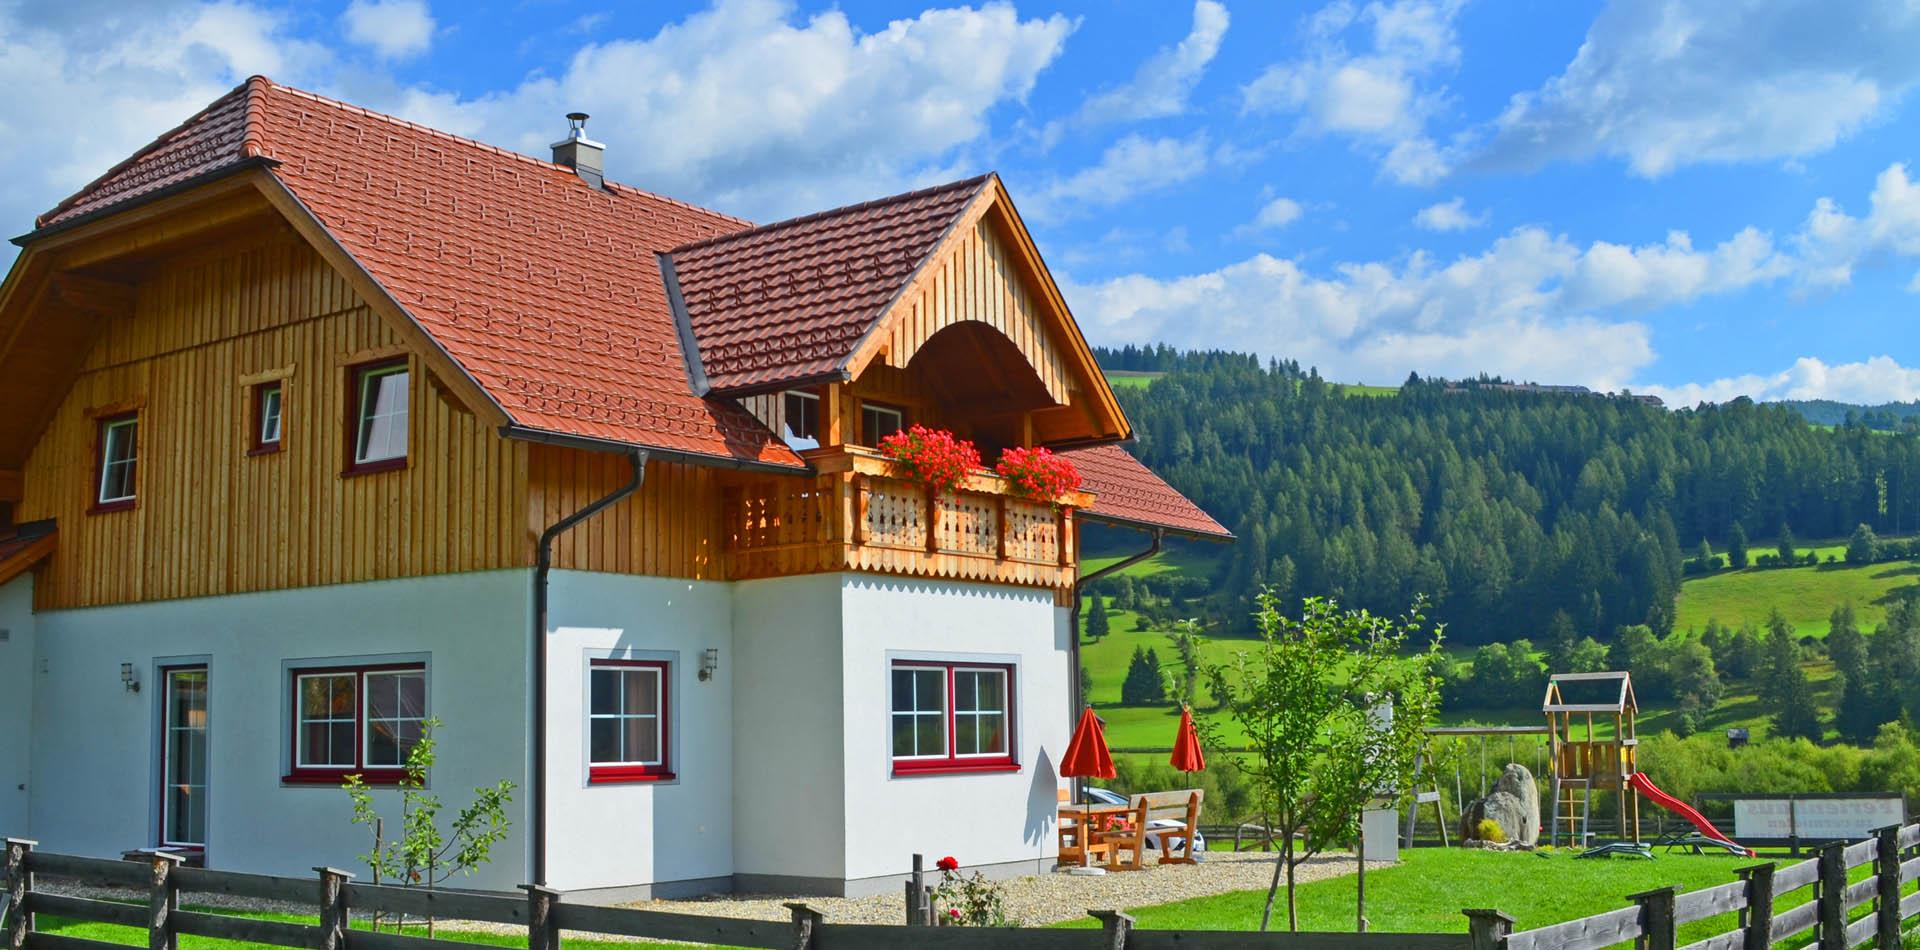 Ferienhaus Longa Brugger Weißpriach